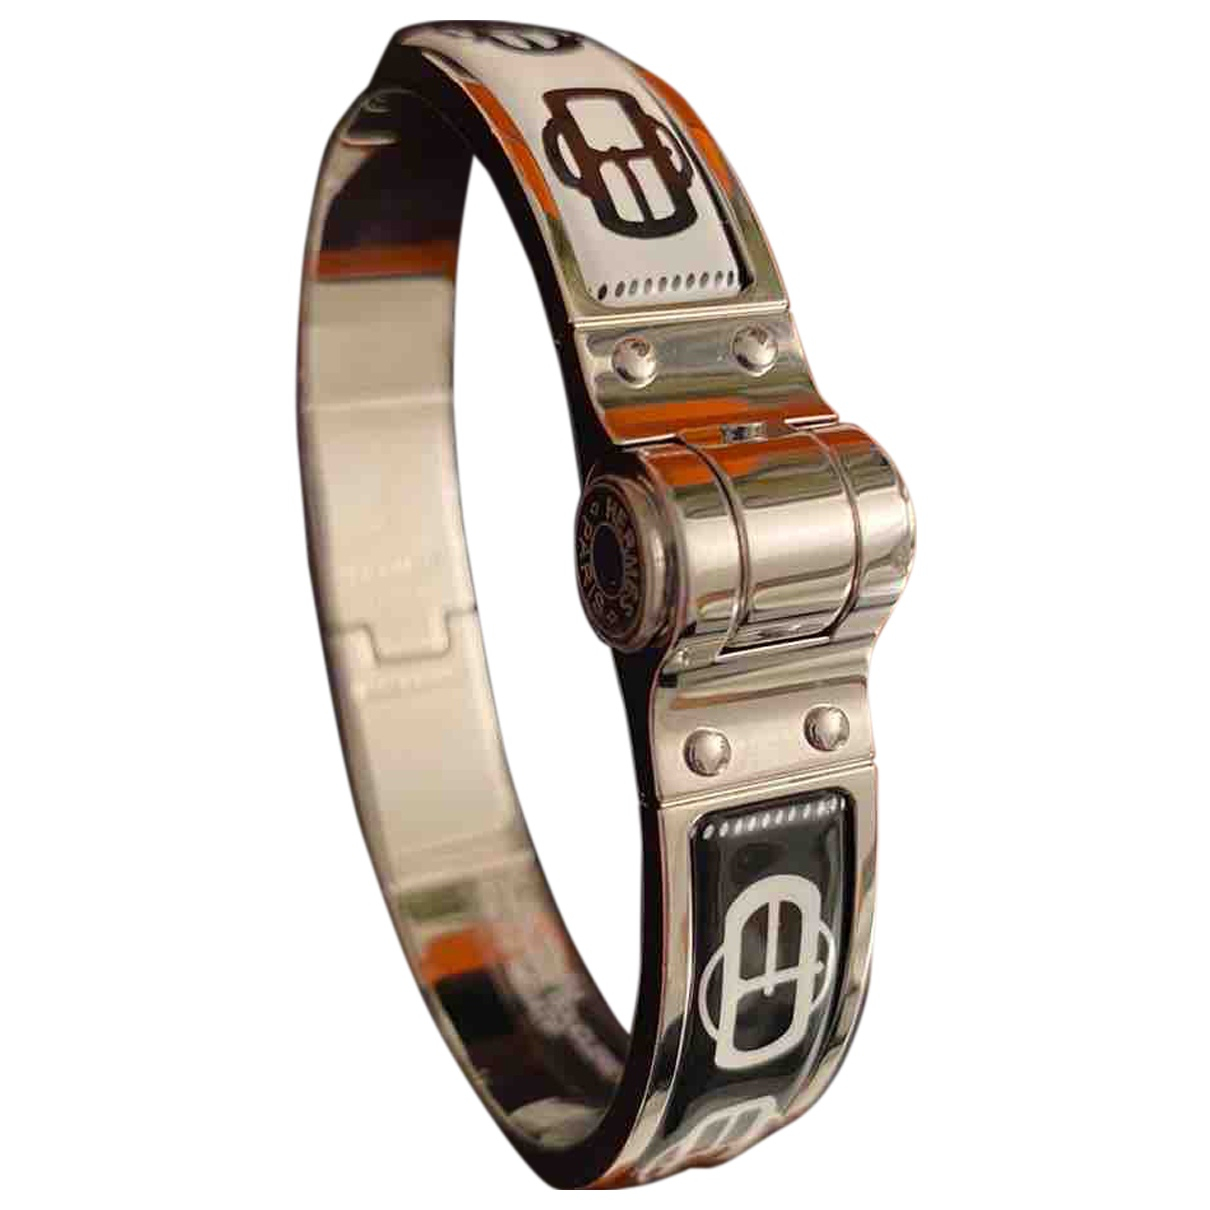 Hermes - Bracelet Bracelet Charniere pour femme en metal